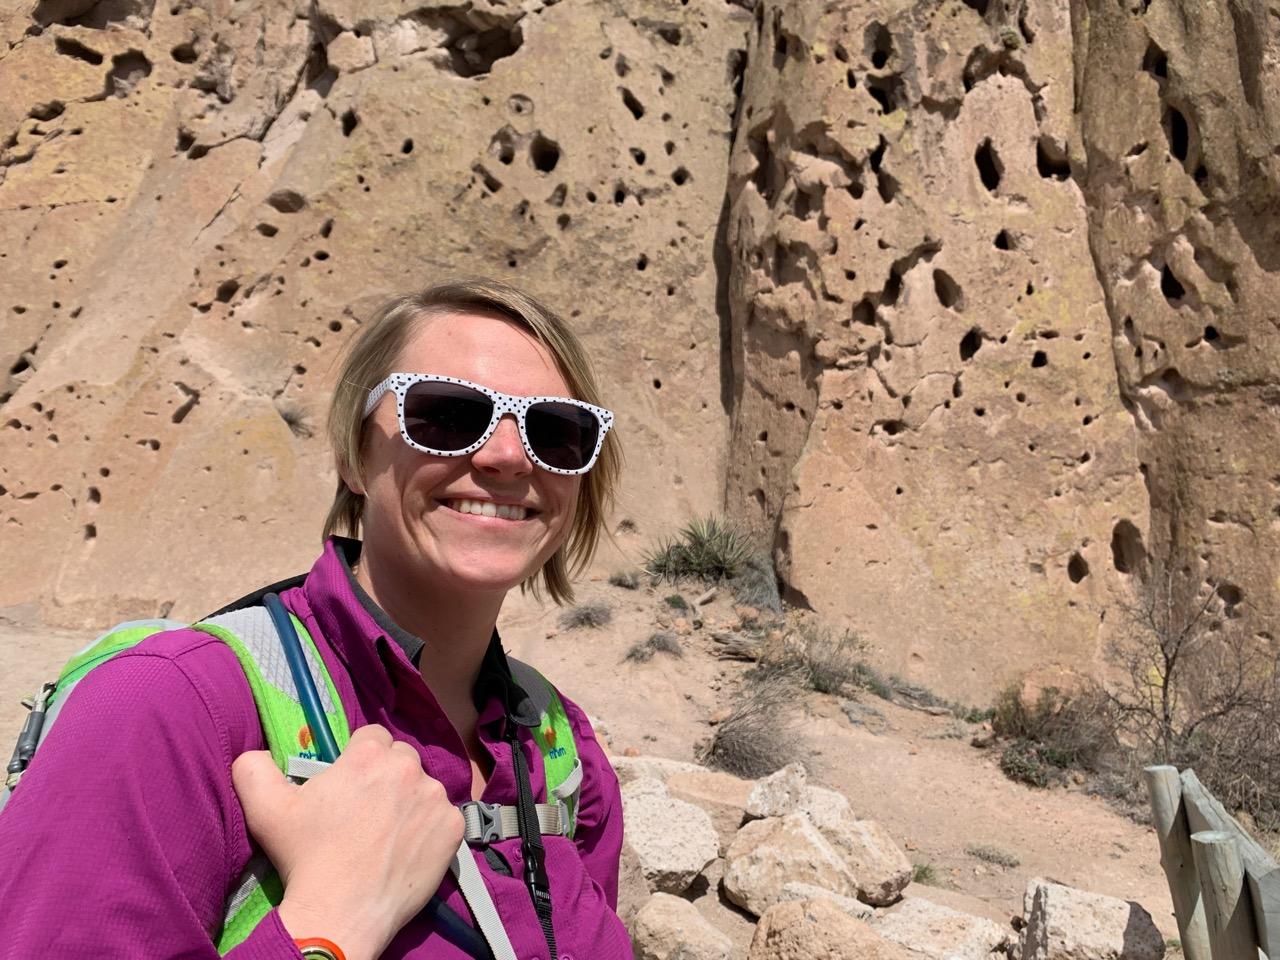 Danielle by the rocks on Frey Trail